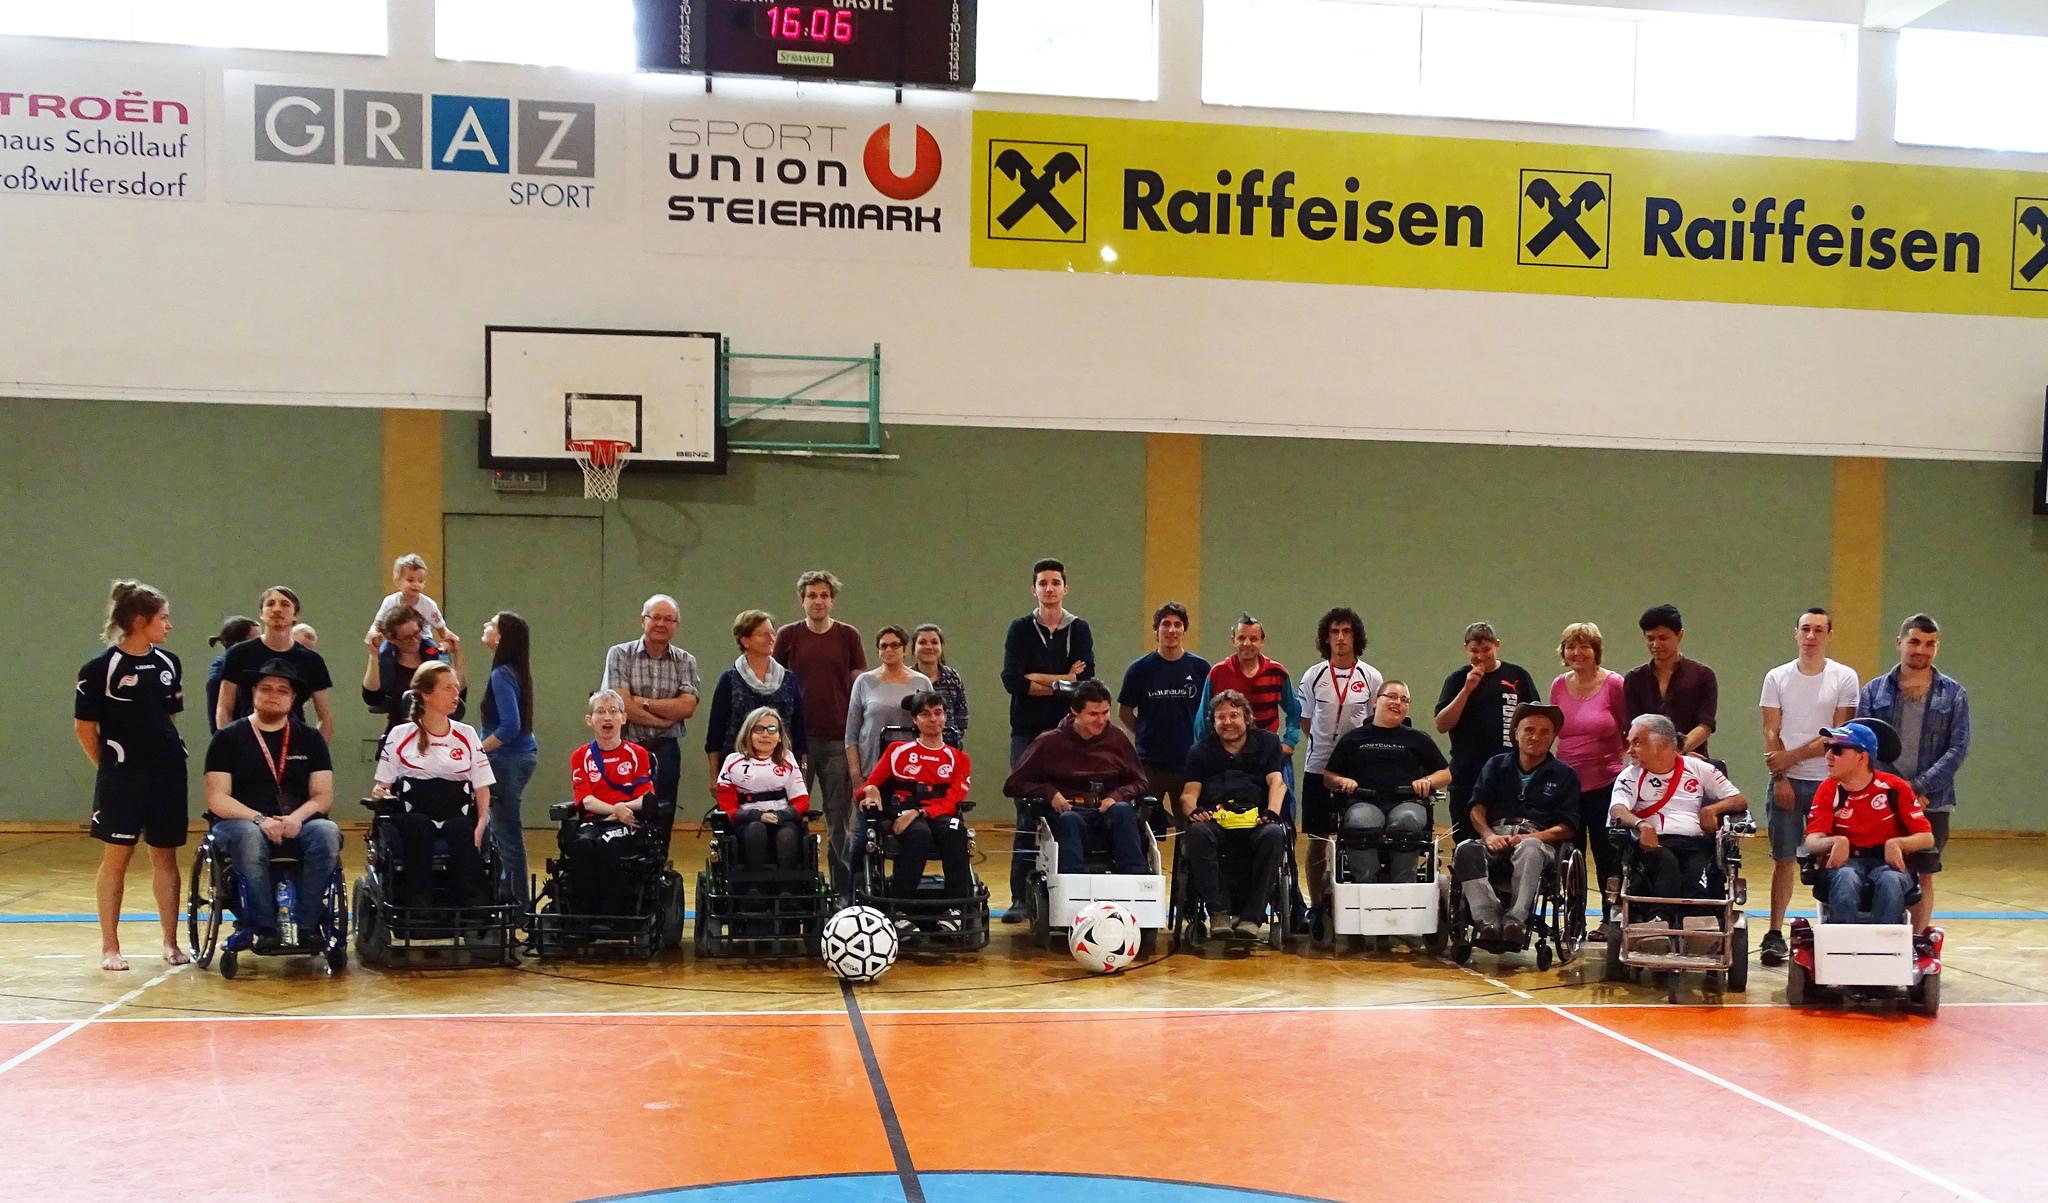 Workshop am 21. Juni 2015 in Graz